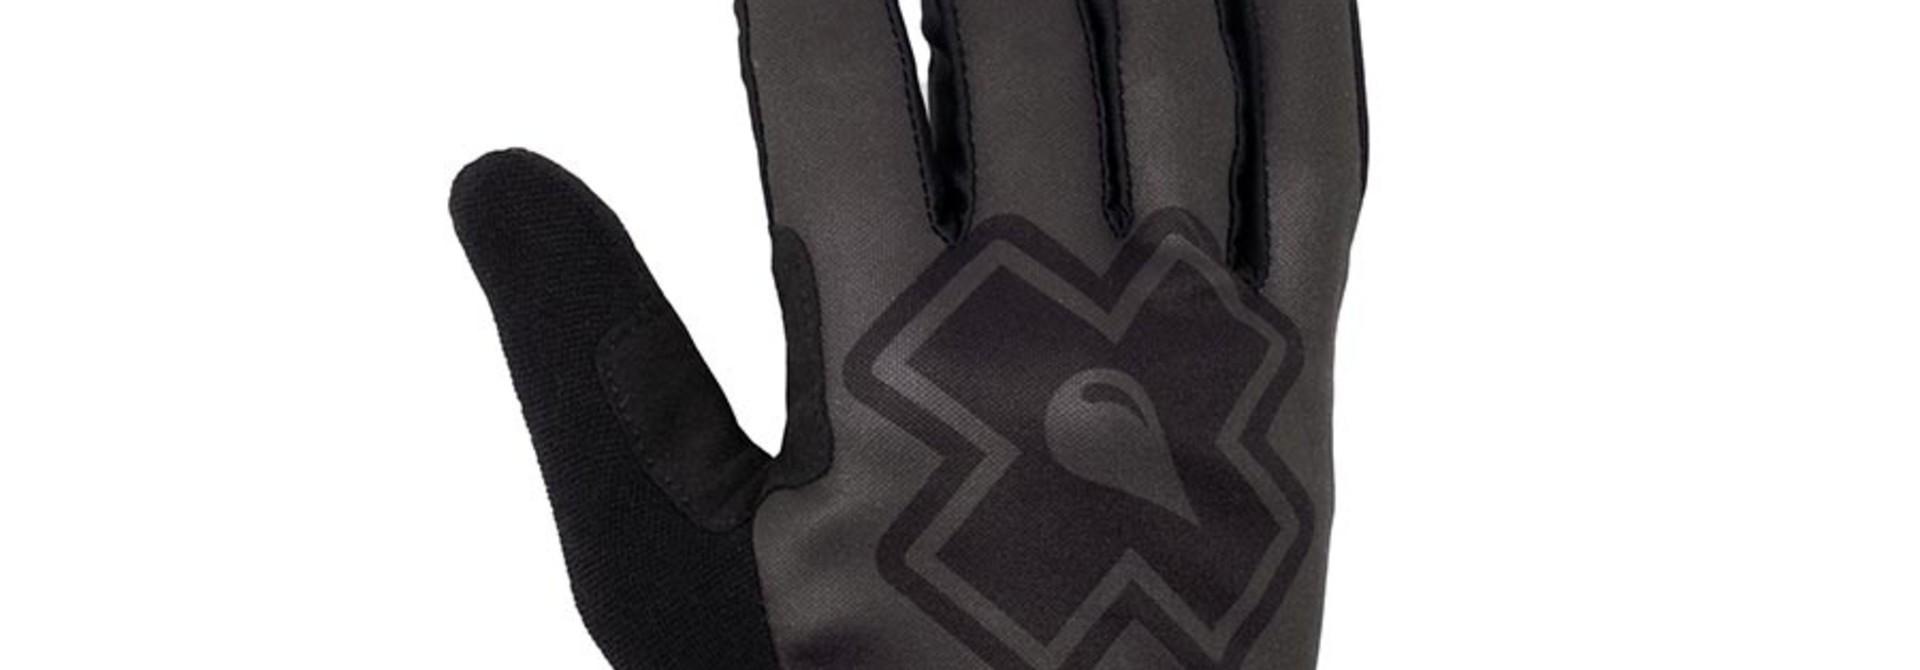 Muc-Off, MTB Ride, Full Finger Gloves, Unisex, Pair